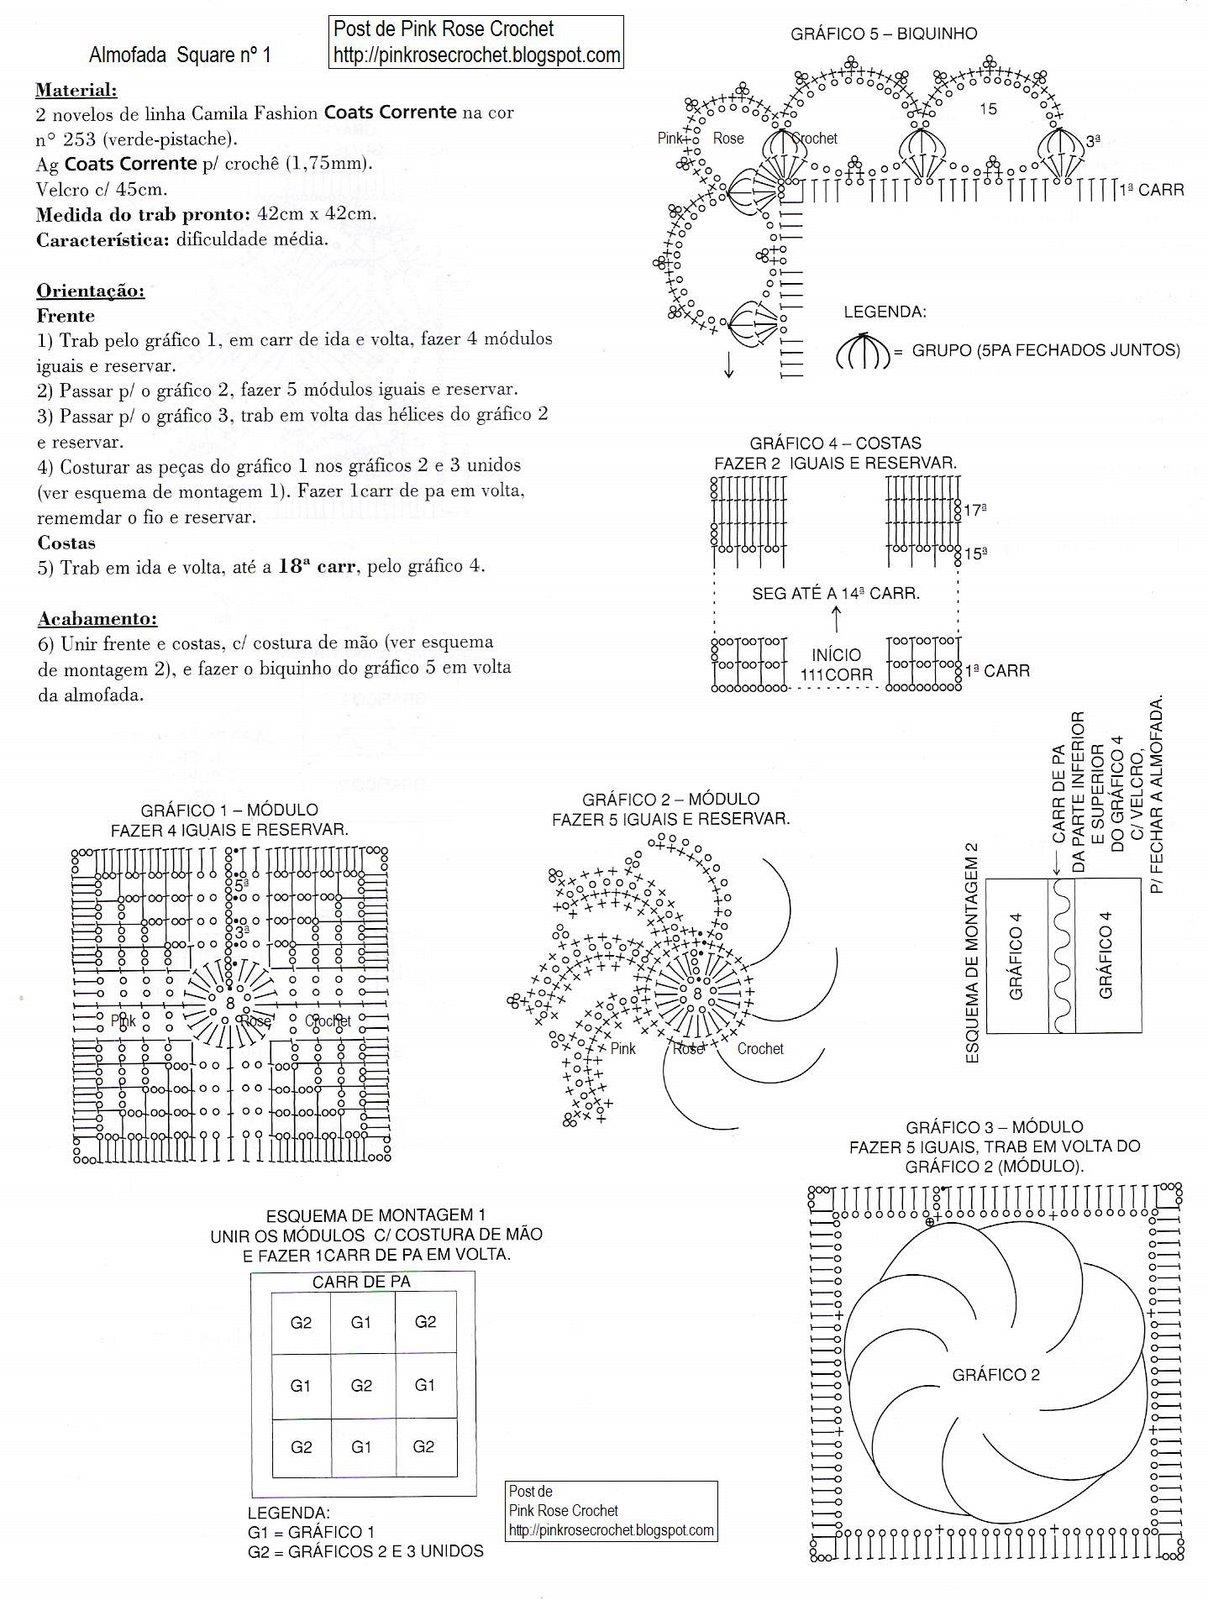 [Almofada+Square+1+gr+PinkRose.jpg]